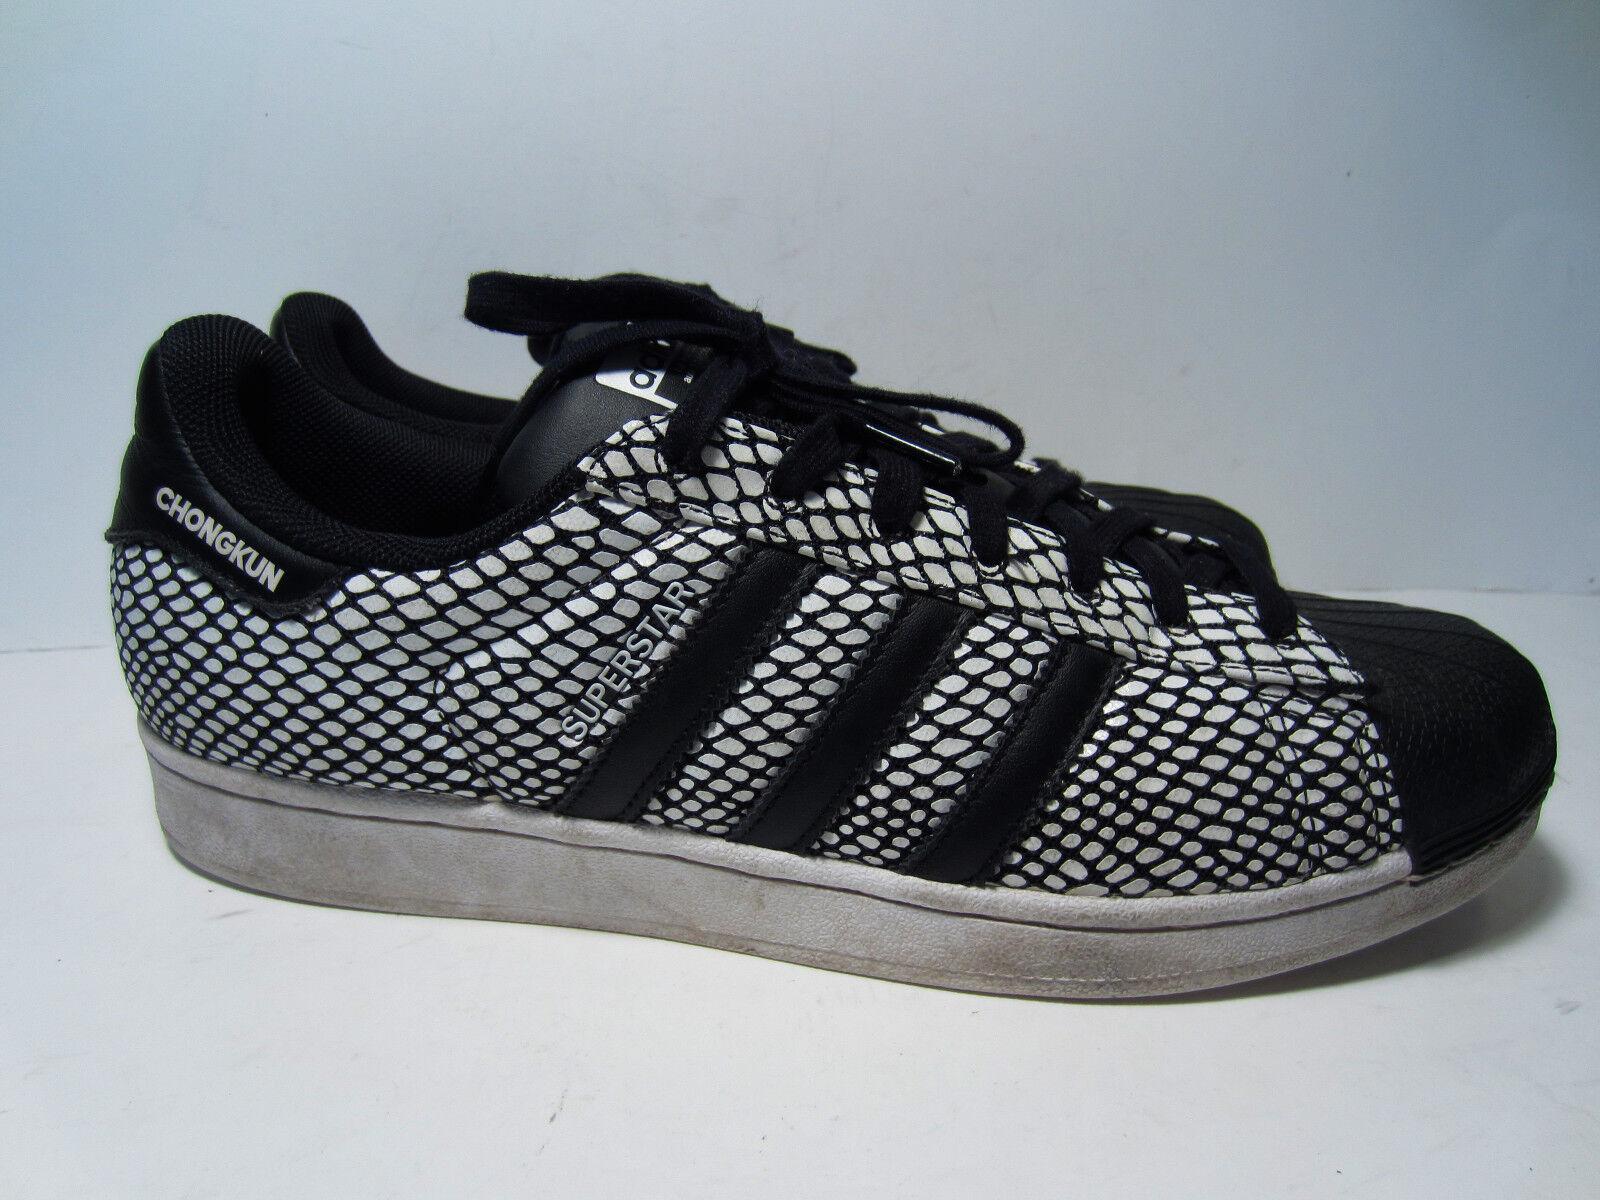 Hombres adidas zapatos superstar chongkun frances Francia zapatos adidas comodos modelo mas vendido de la marca 9912ec